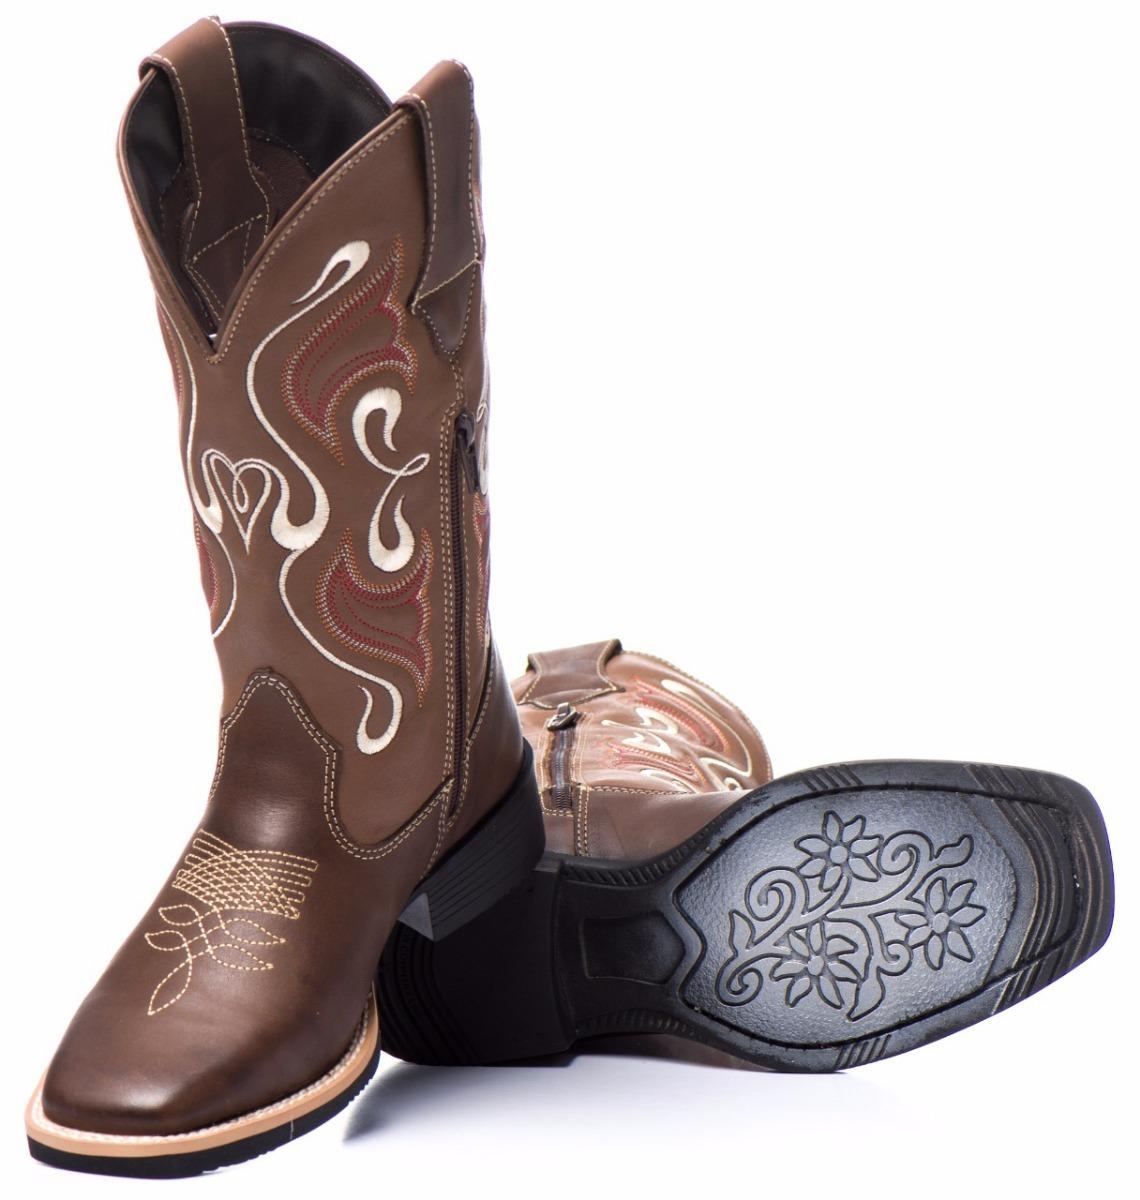 413681ee55 bota texana feminina 100% couro mulher country. Carregando zoom.